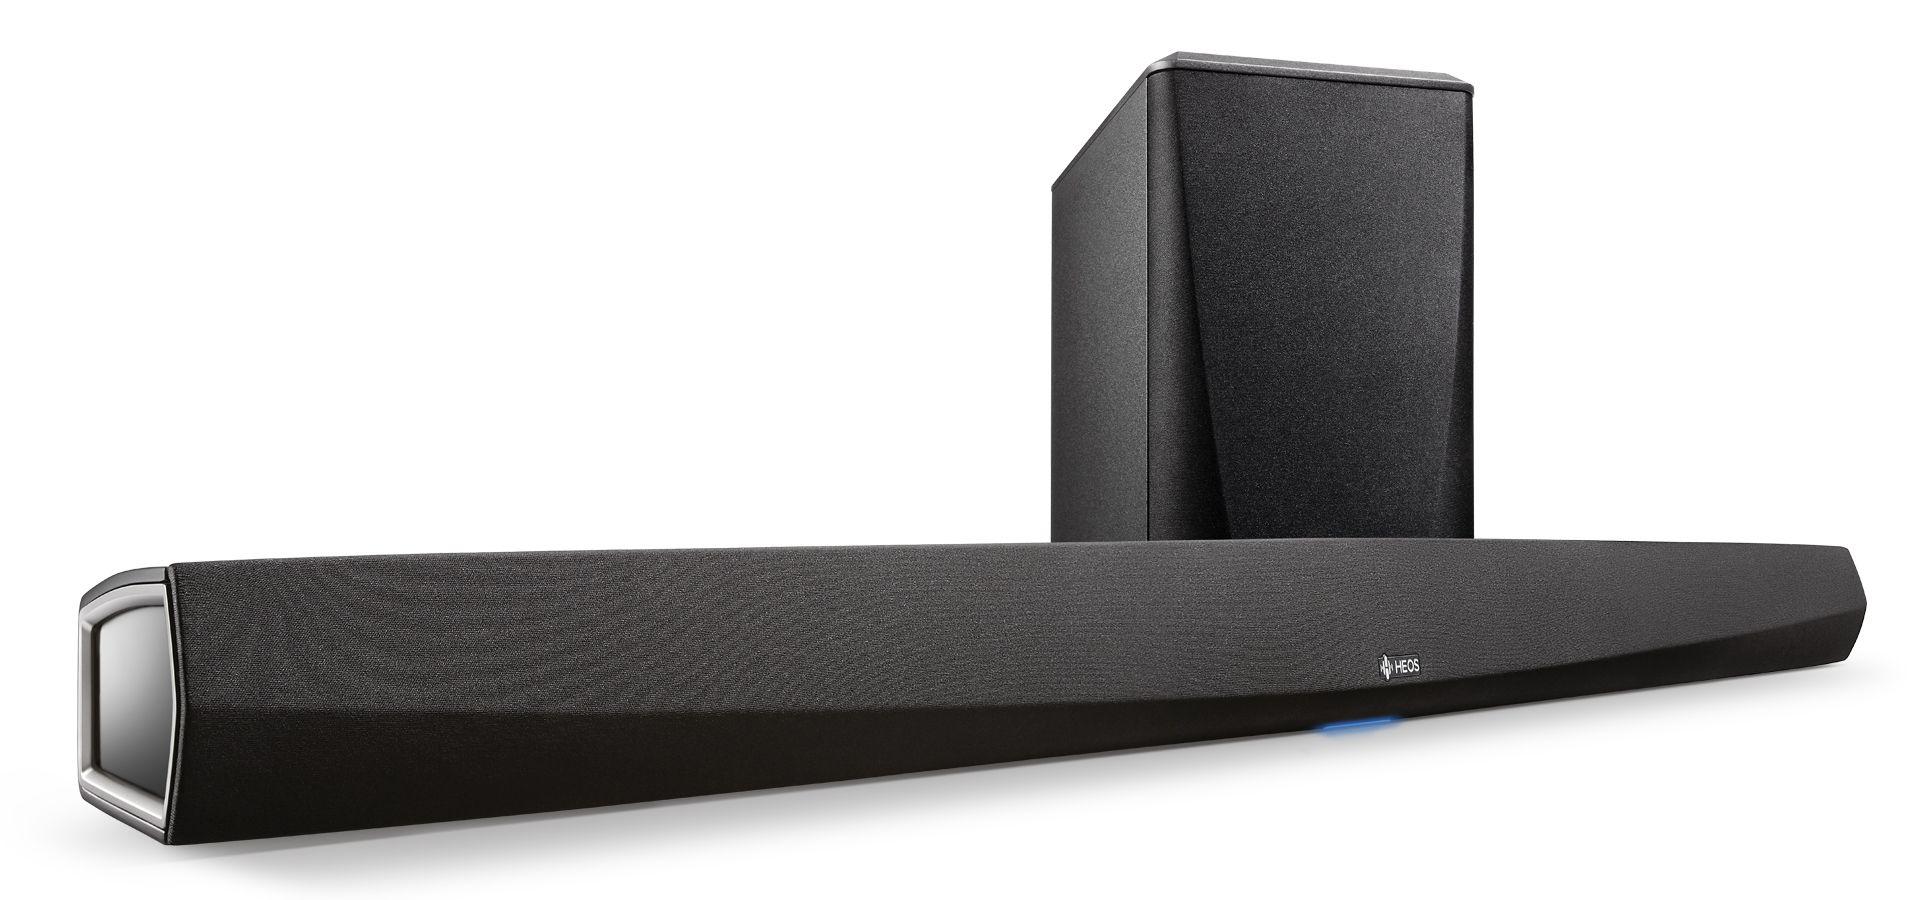 Heos soundbar setup sound bar alexa device amazon